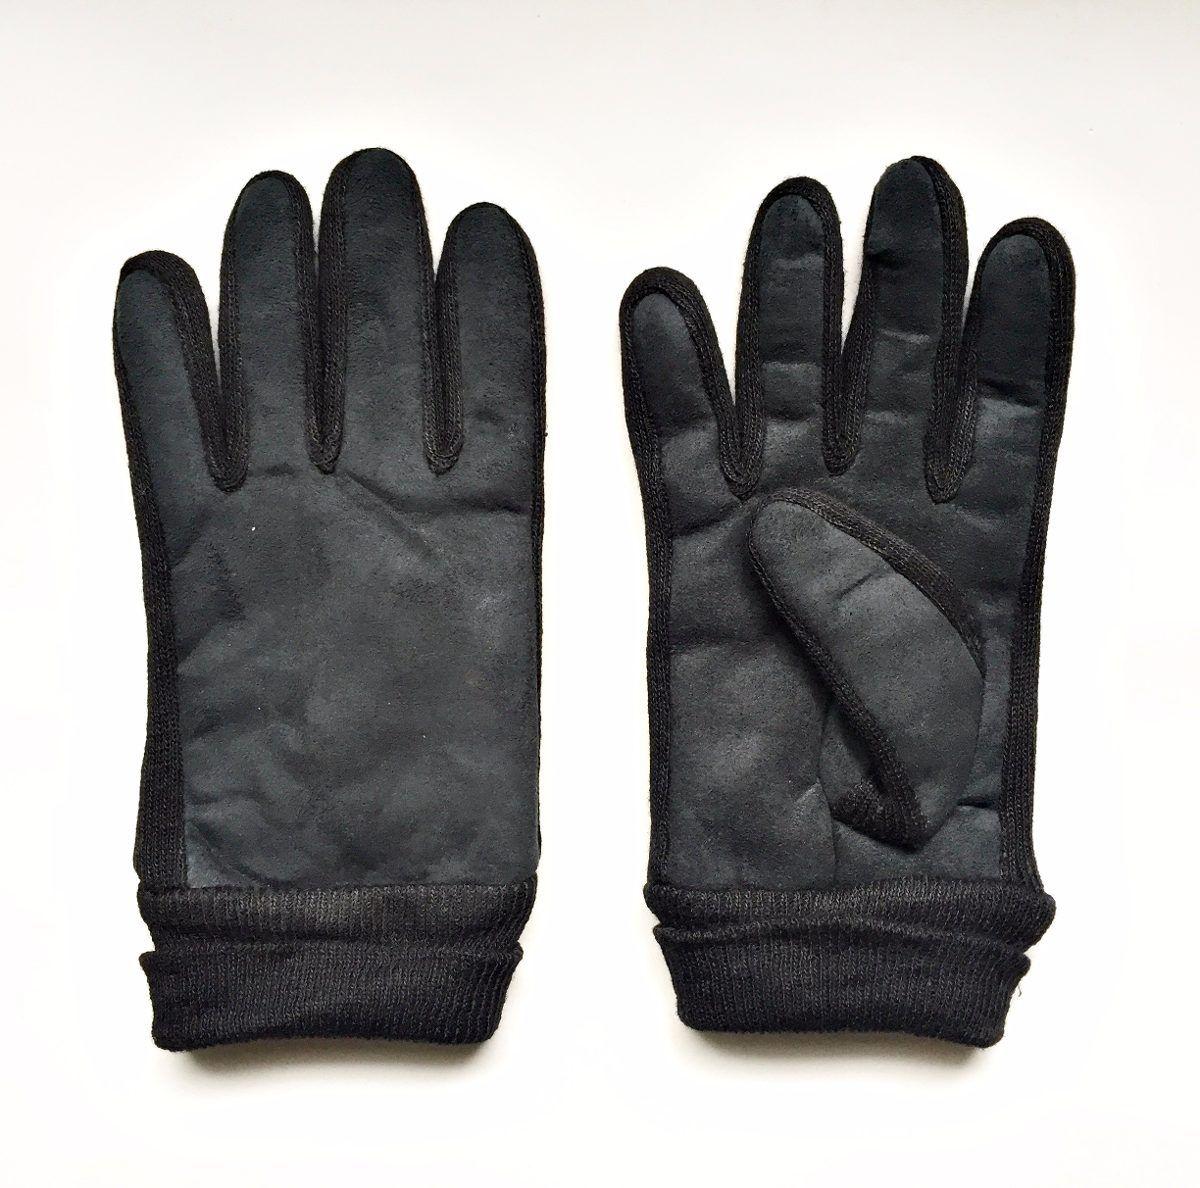 Luva De Lã Masculina Preta Super Estilosa Para Inverno Frio